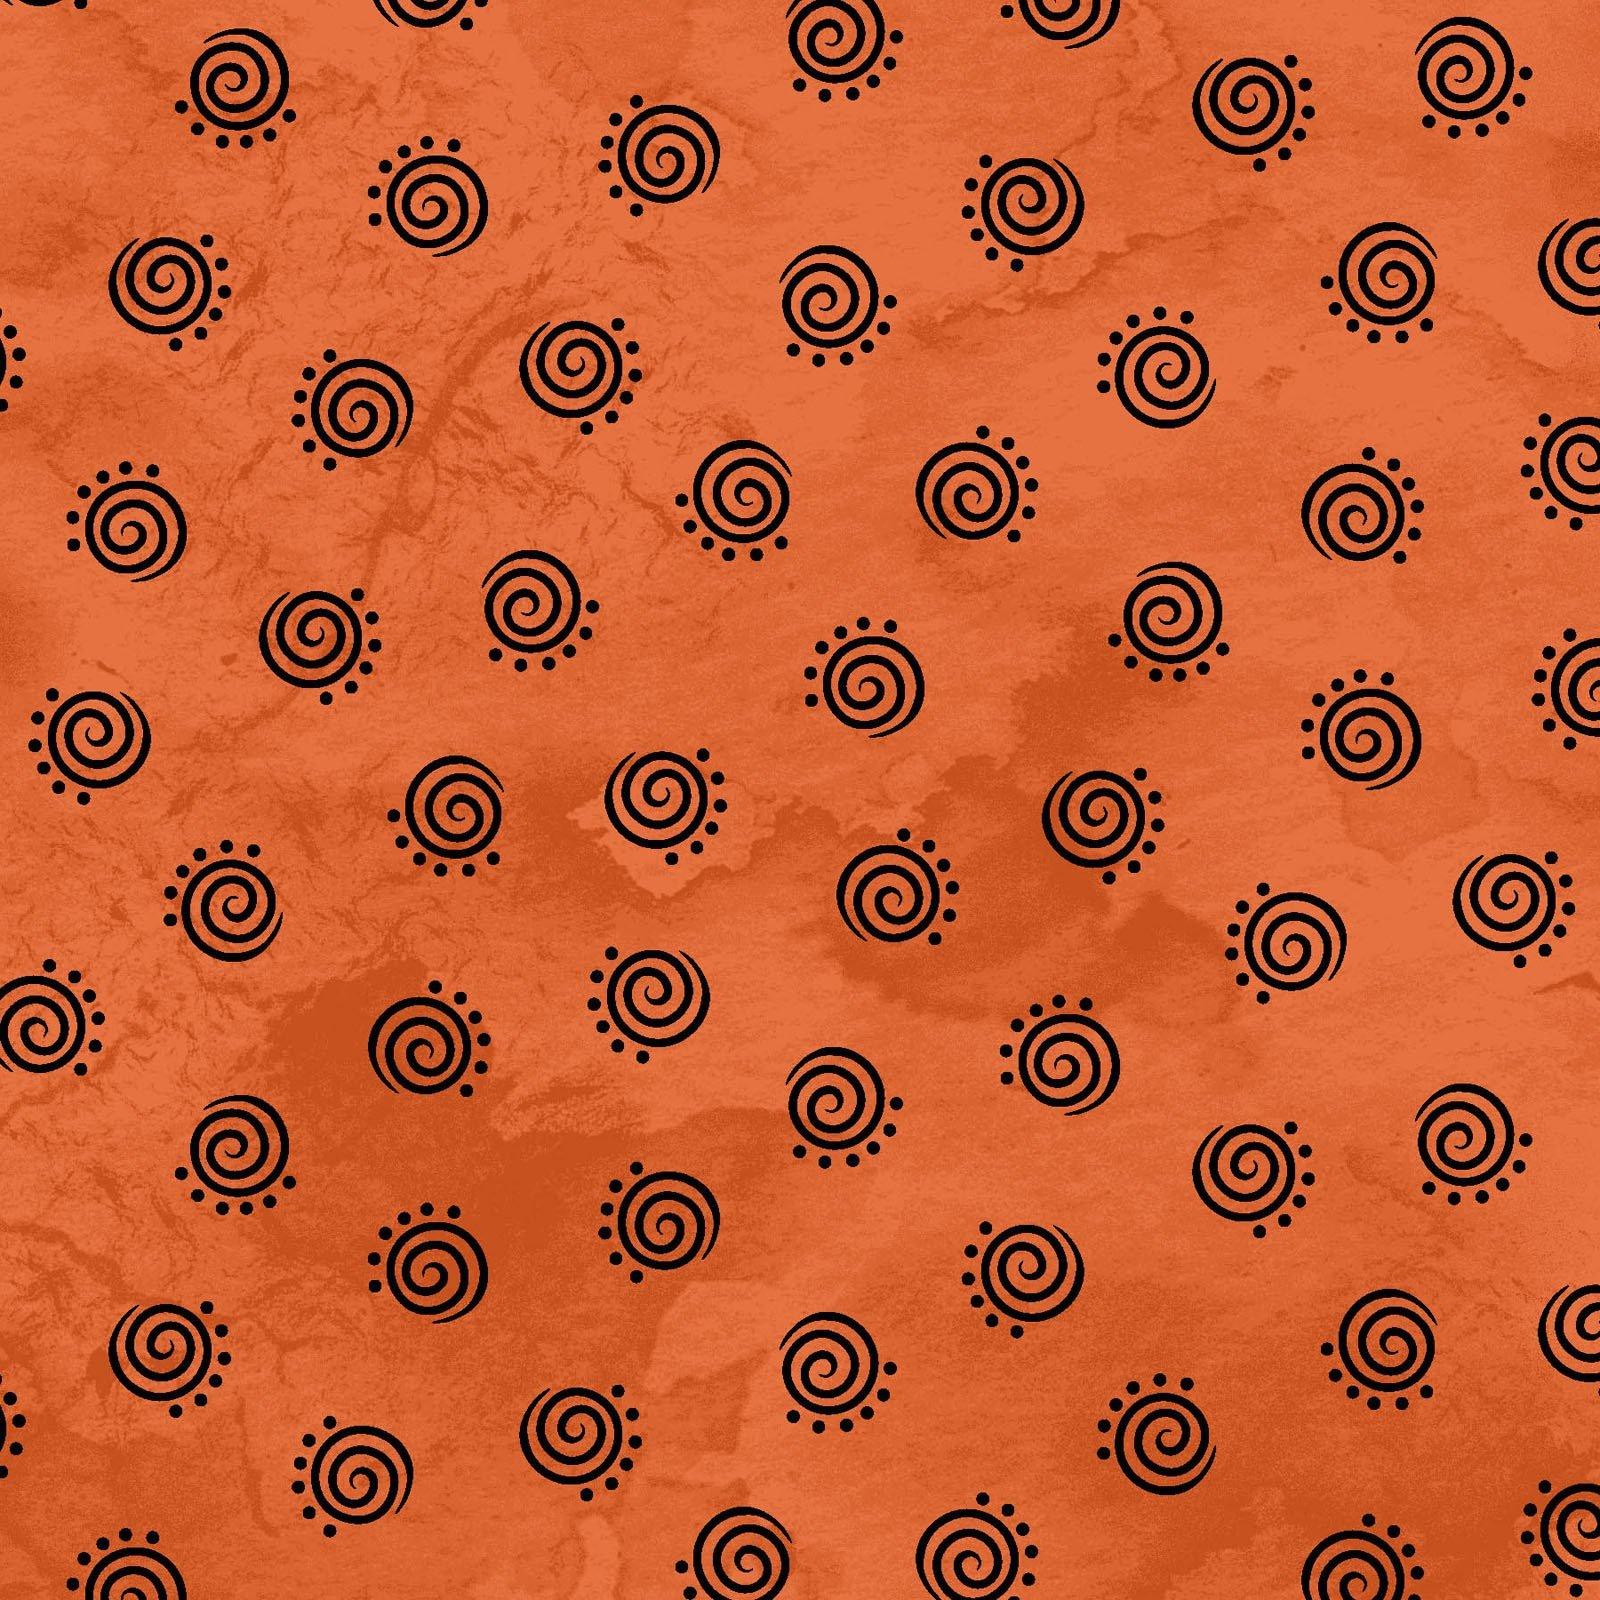 Robin Kingsley - Halloweenie Geo Swirls Orange